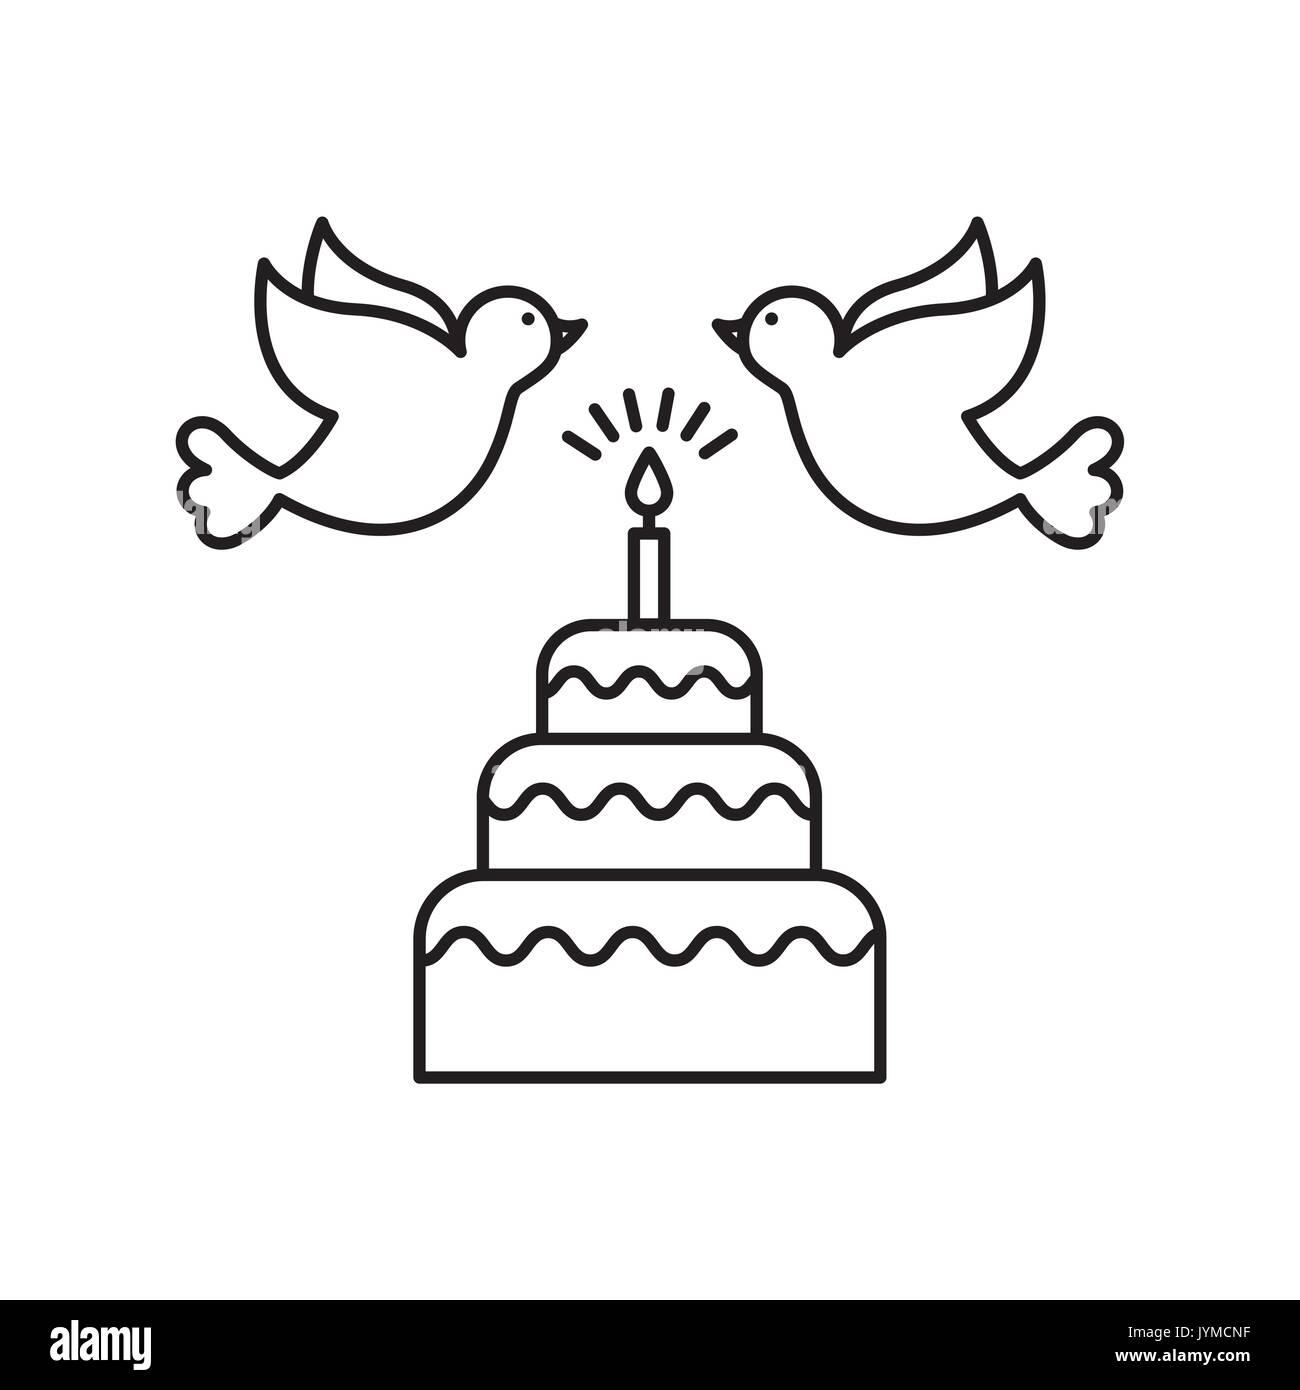 wedding invitation icon design Stock Vector Art & Illustration ...